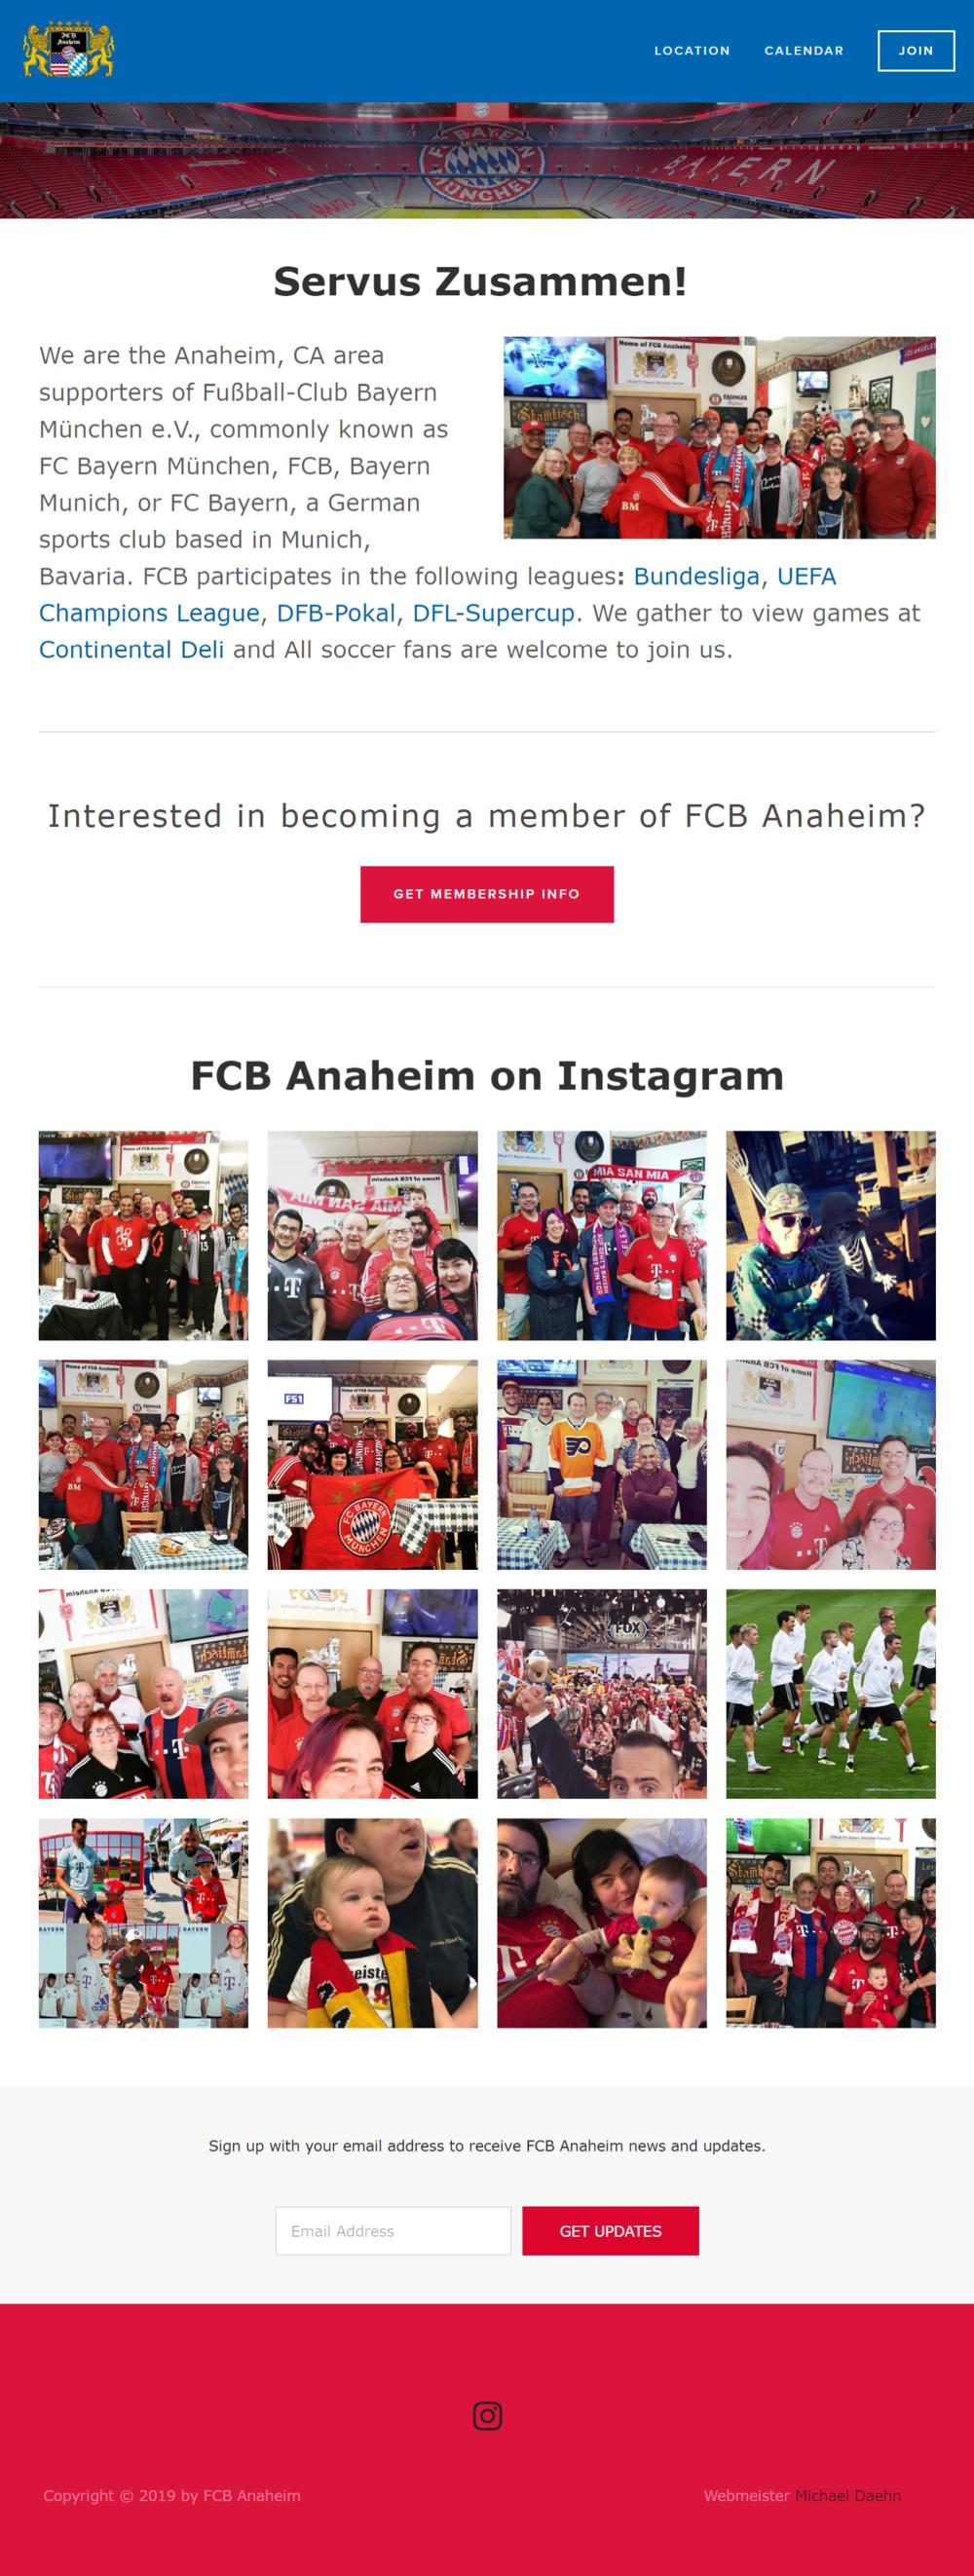 screenshot-www.anaheimfcb.com-2019.02.14-11-44-12.png